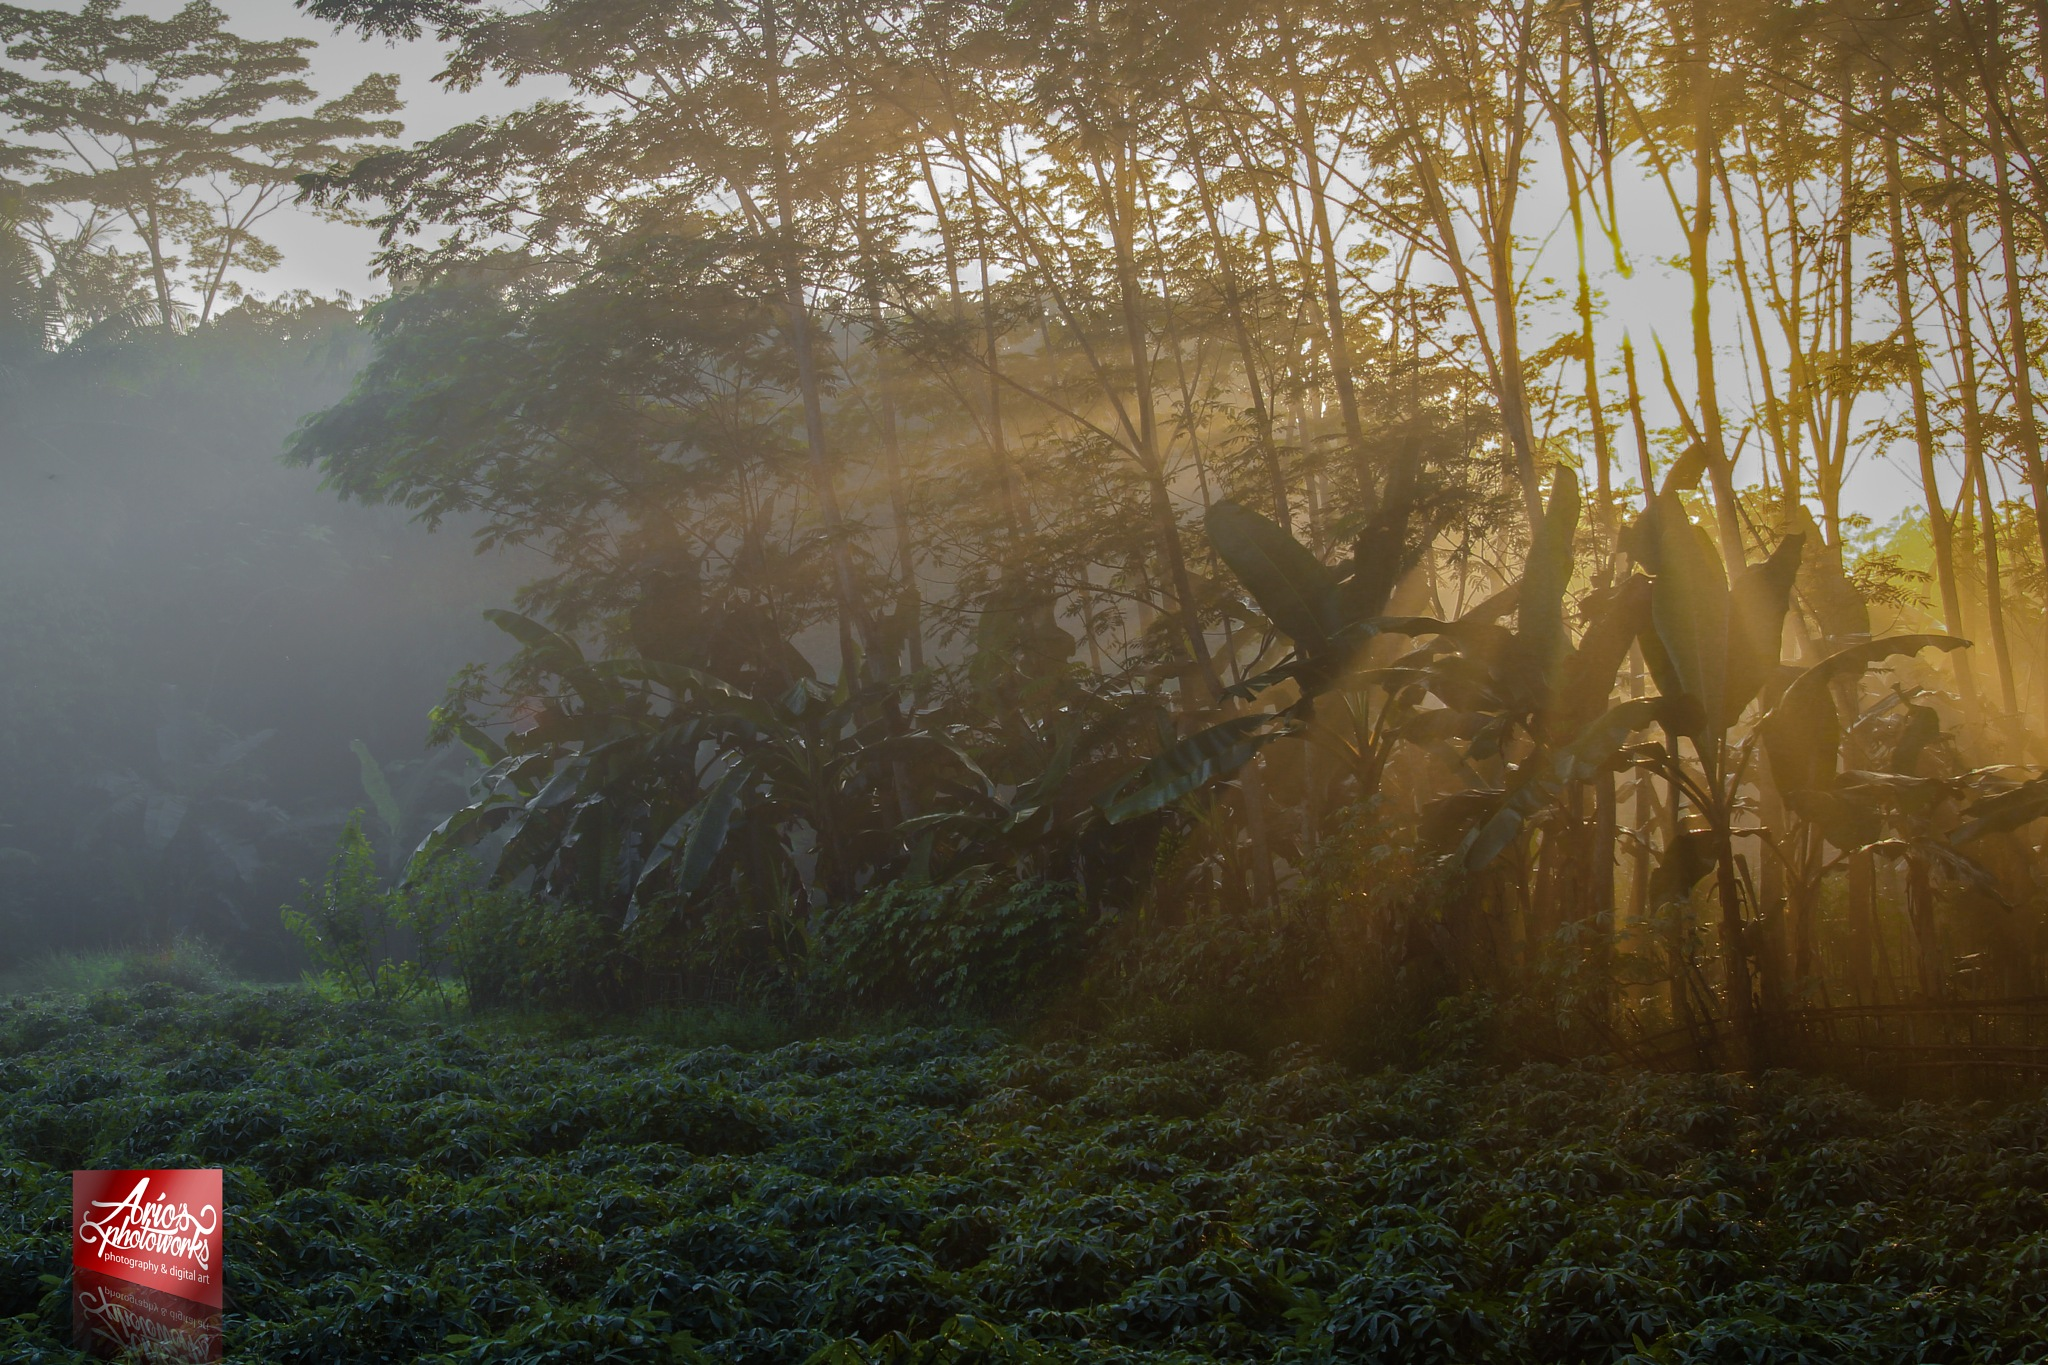 rayoflight by ario photowork